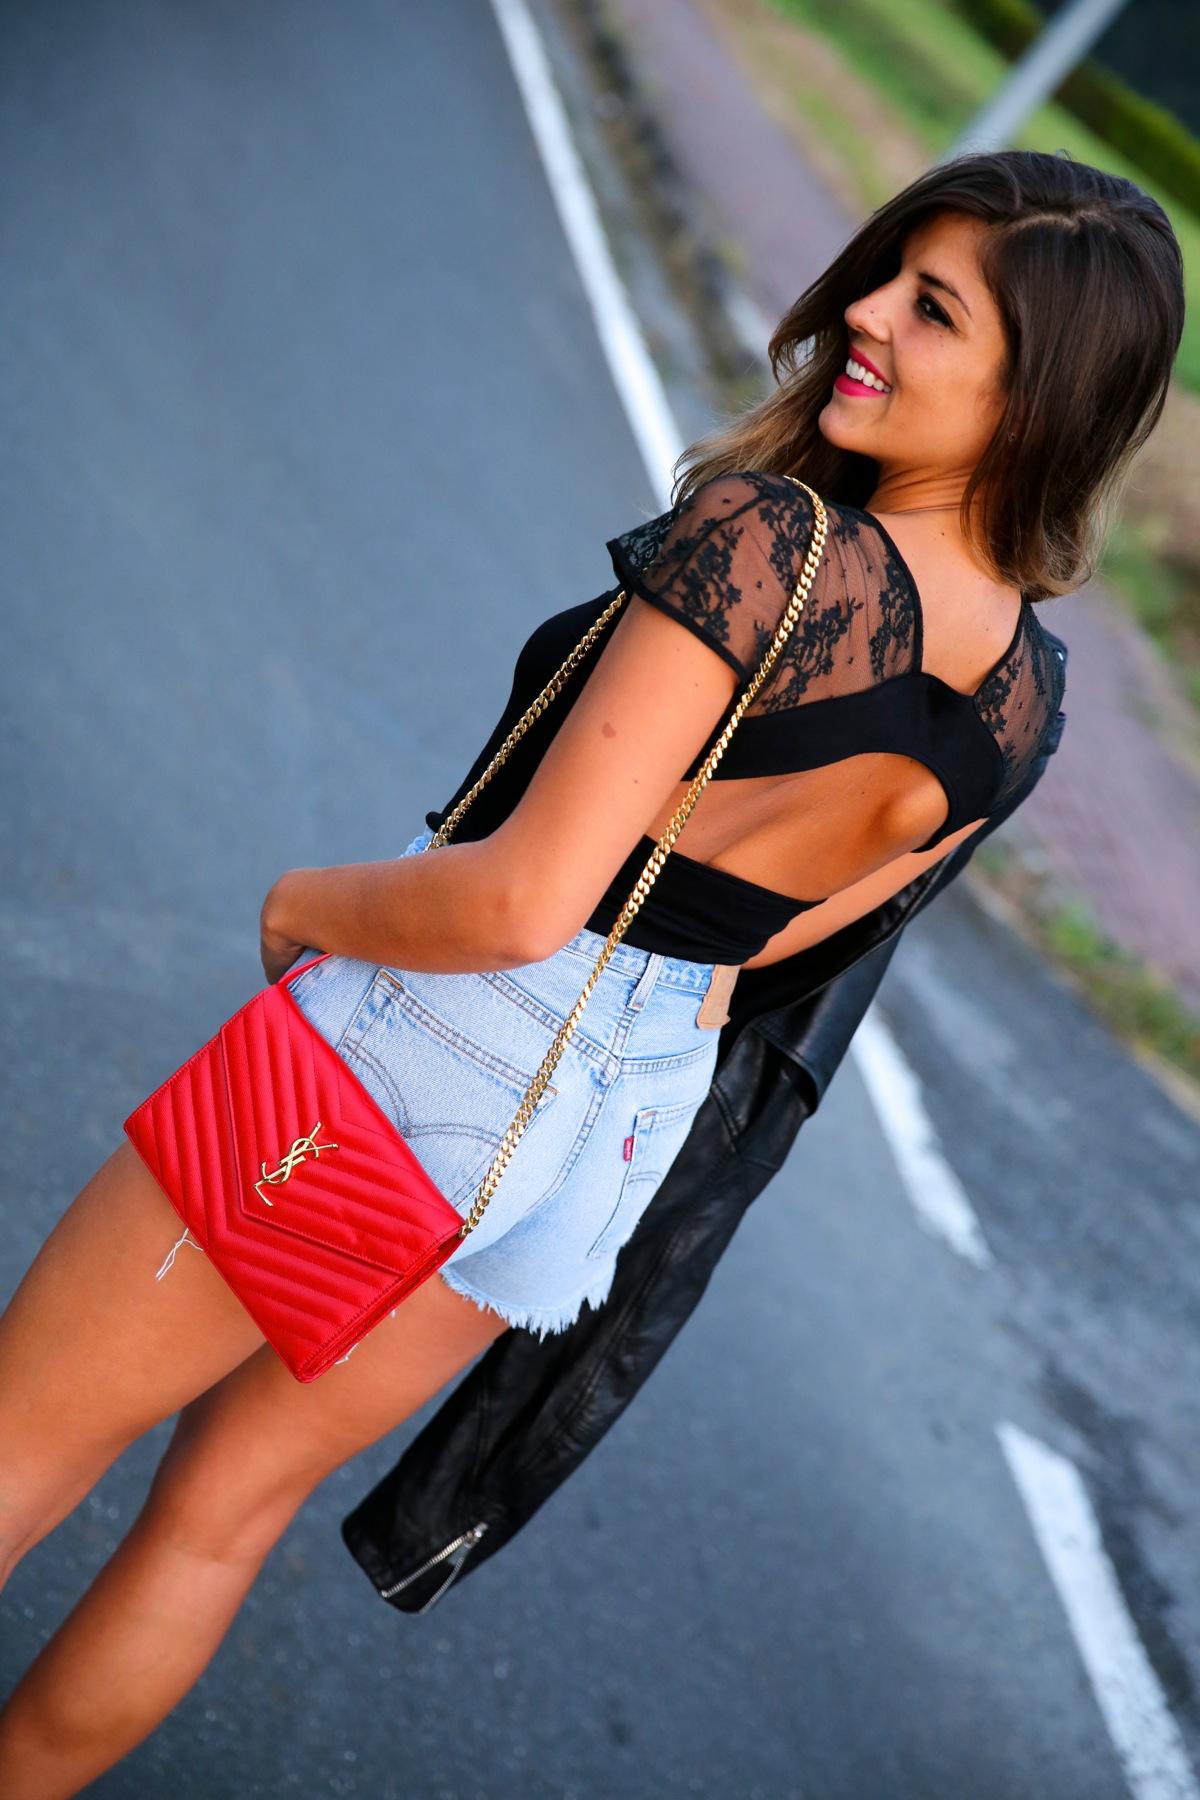 trendy_taste-look-outfit-street_style-ootd-blog-blogger-fashion_spain-moda_españa-denim_shorts-shorts_vaqueros-chaqueta_cuero-leather_jacket-ysl-saint_laurent-4